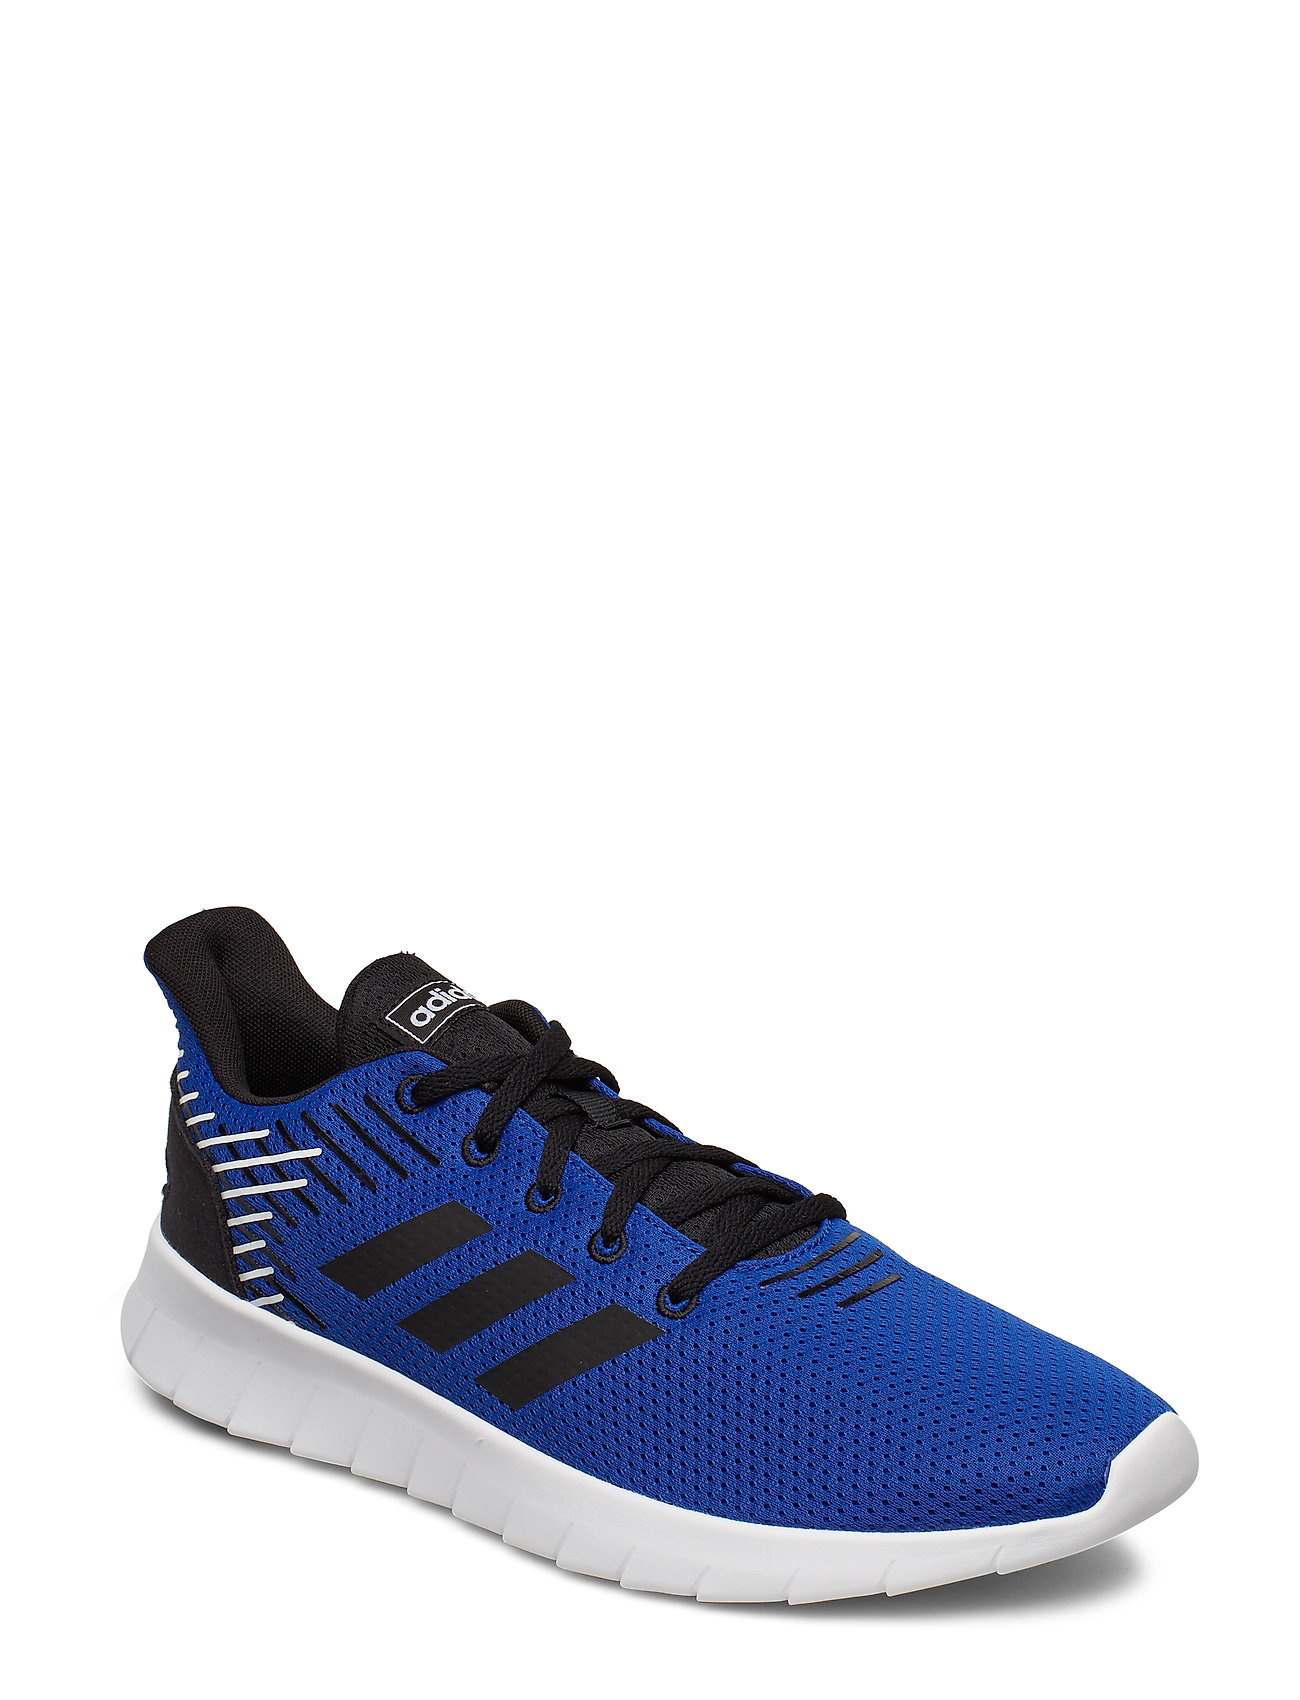 adidas Performance ASWEERUN - CROYAL/CBLACK/FTWWHT